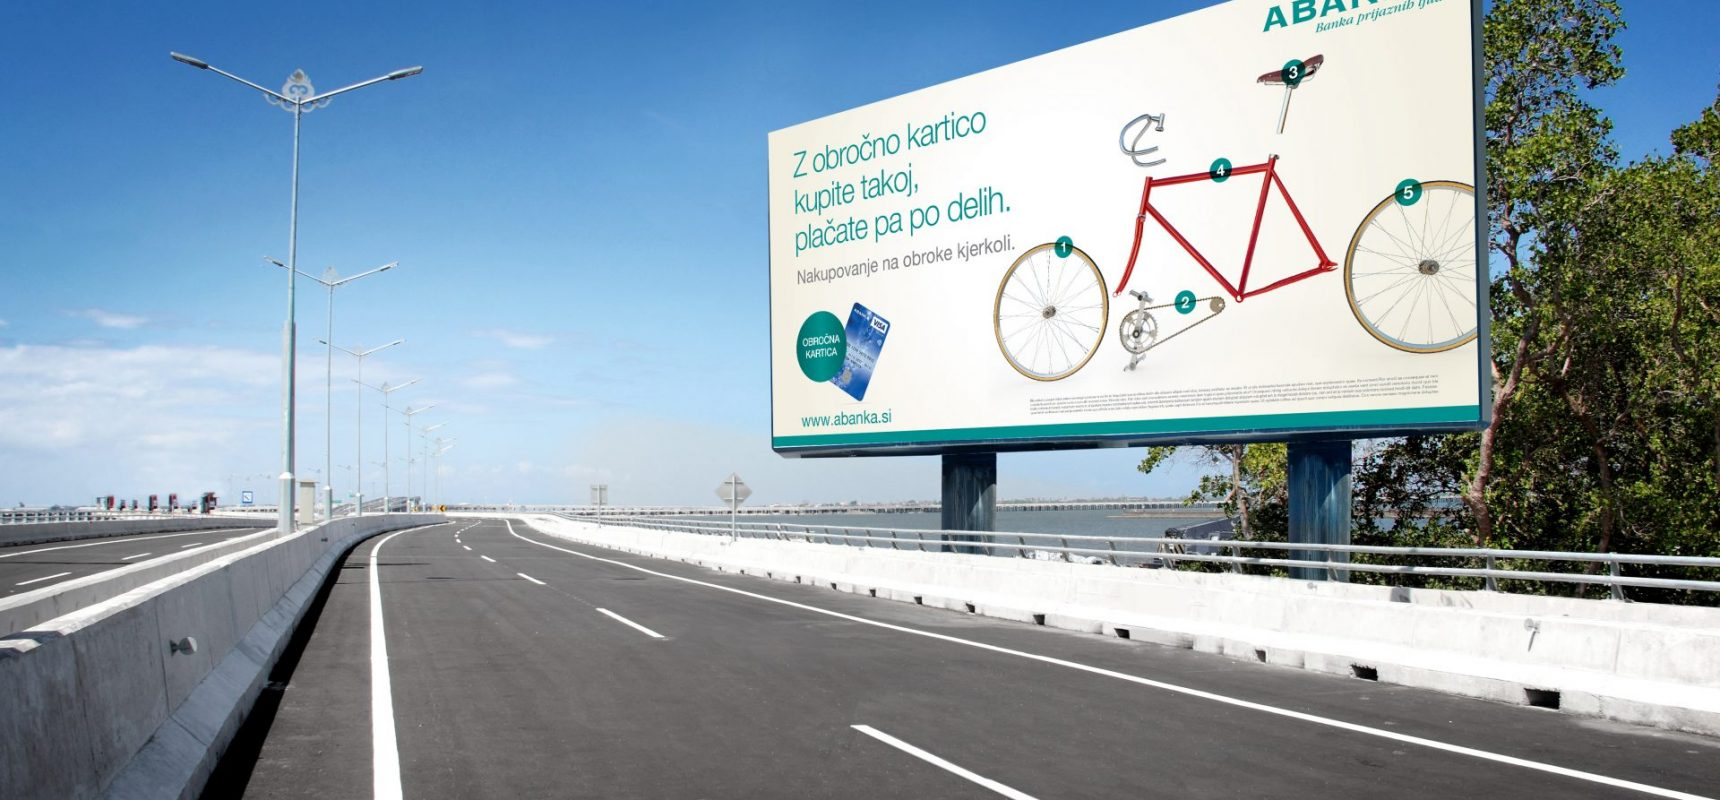 abanka_billboard